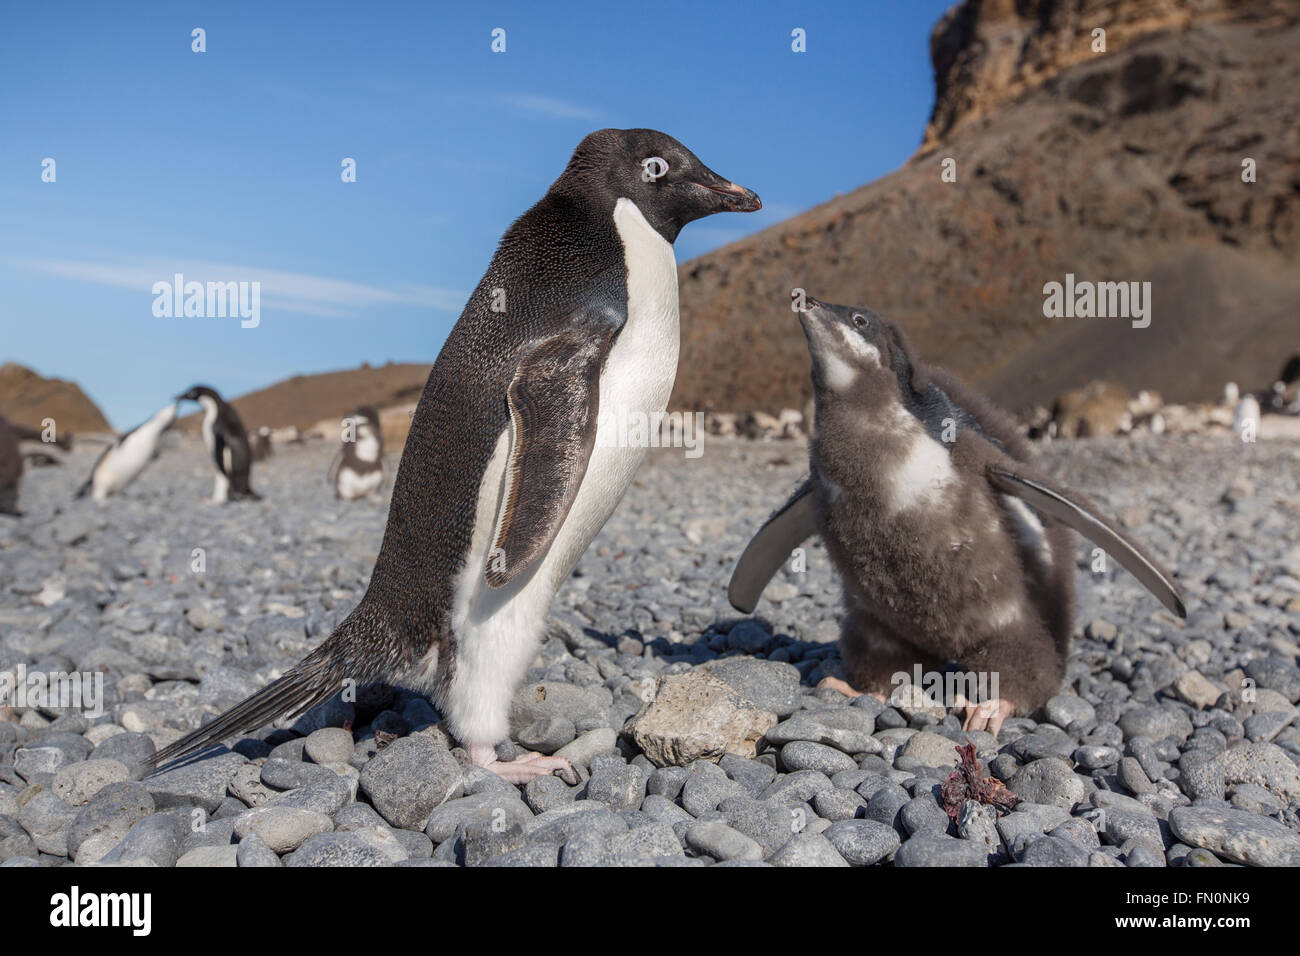 Antarctica, Antarctic peninsula, Brown Bluff. Adelie penguin, adult and chick - Stock Image